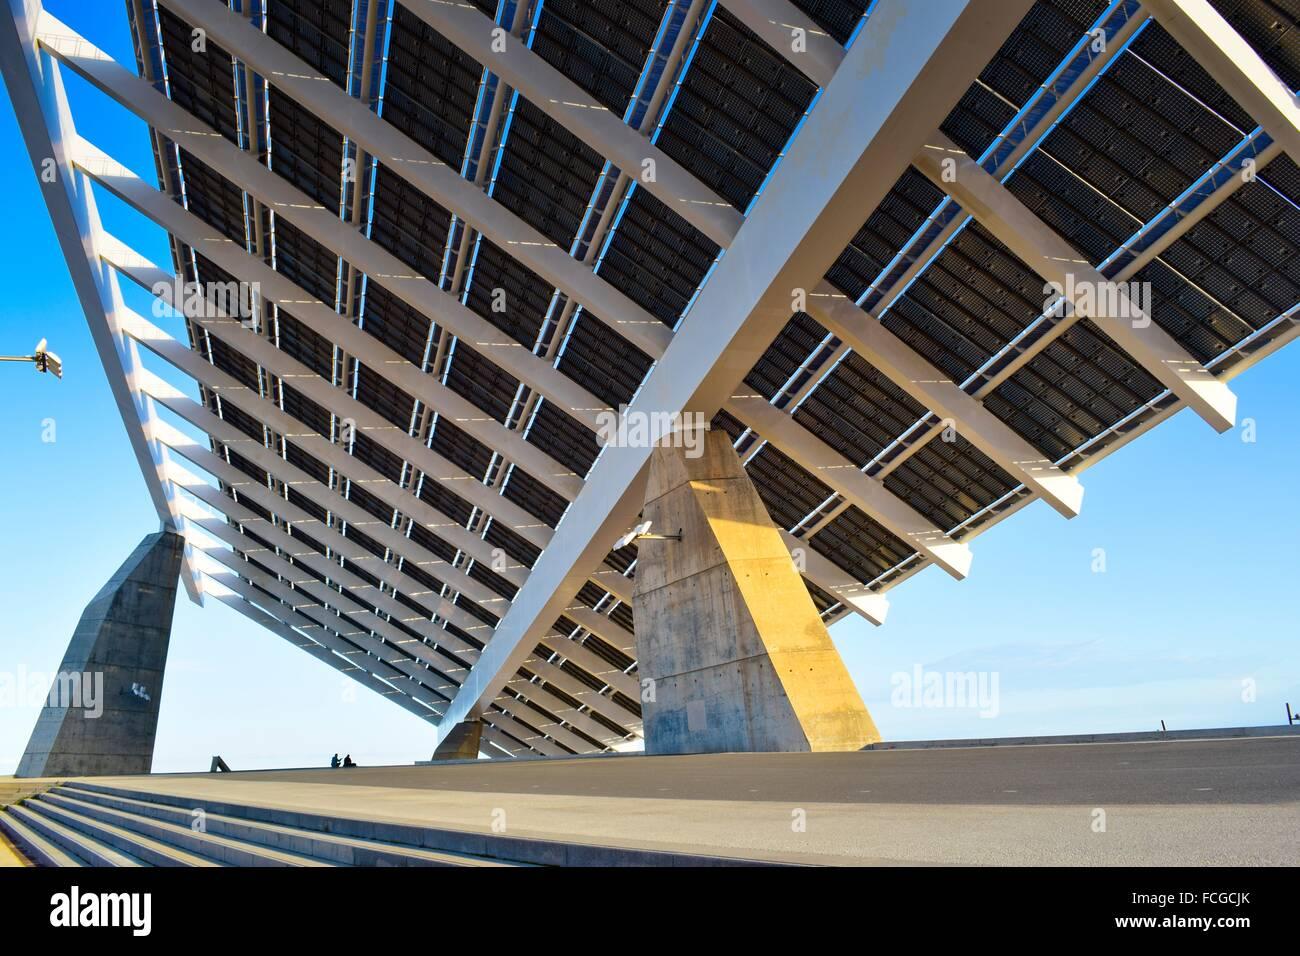 Photovoltaic pergola giant solar panel park forum diagonal mar stock photo royalty free - Solar barcelona ...